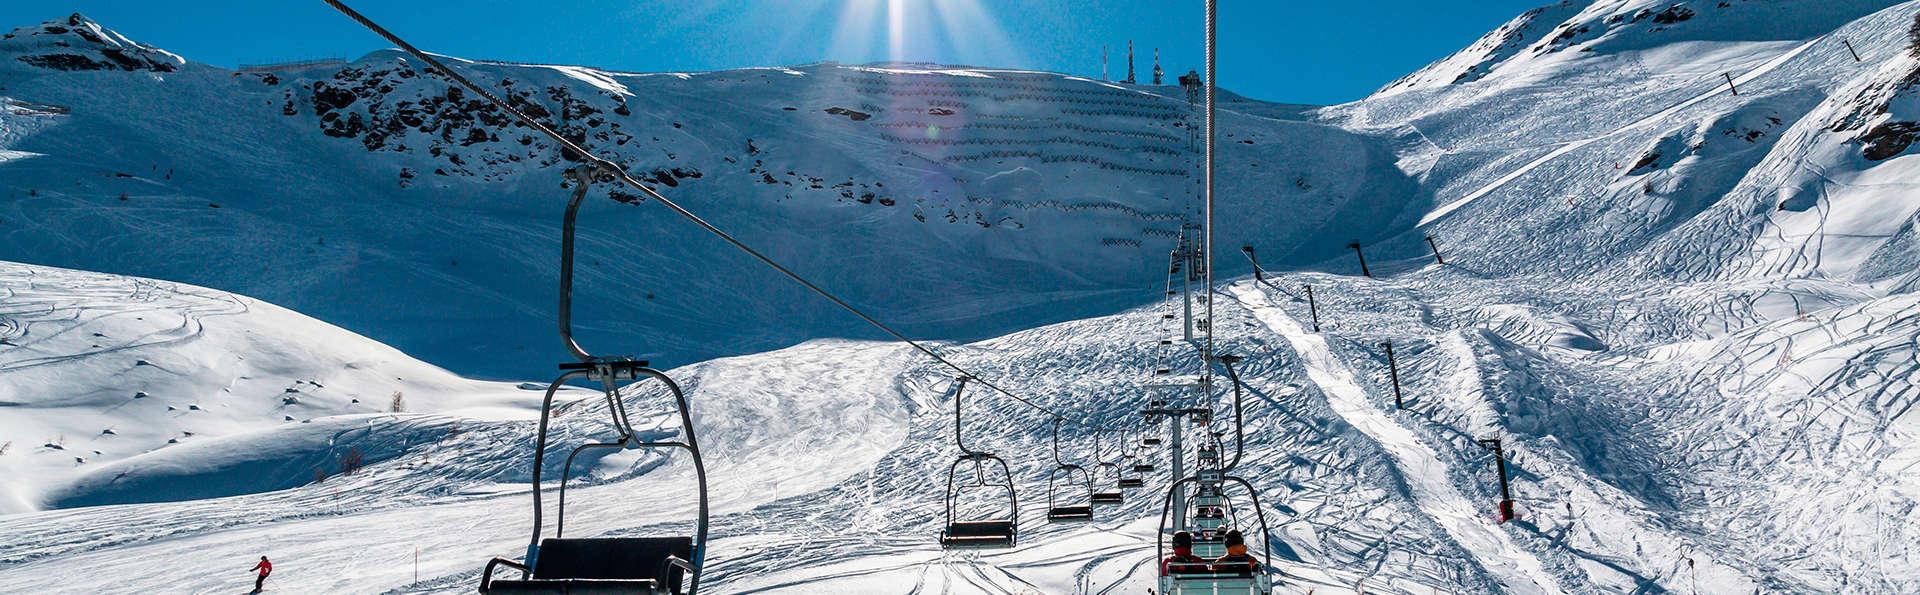 Vacancéole - Appart'Vacances Pyrénées 2000 - EDIT_destination.jpg